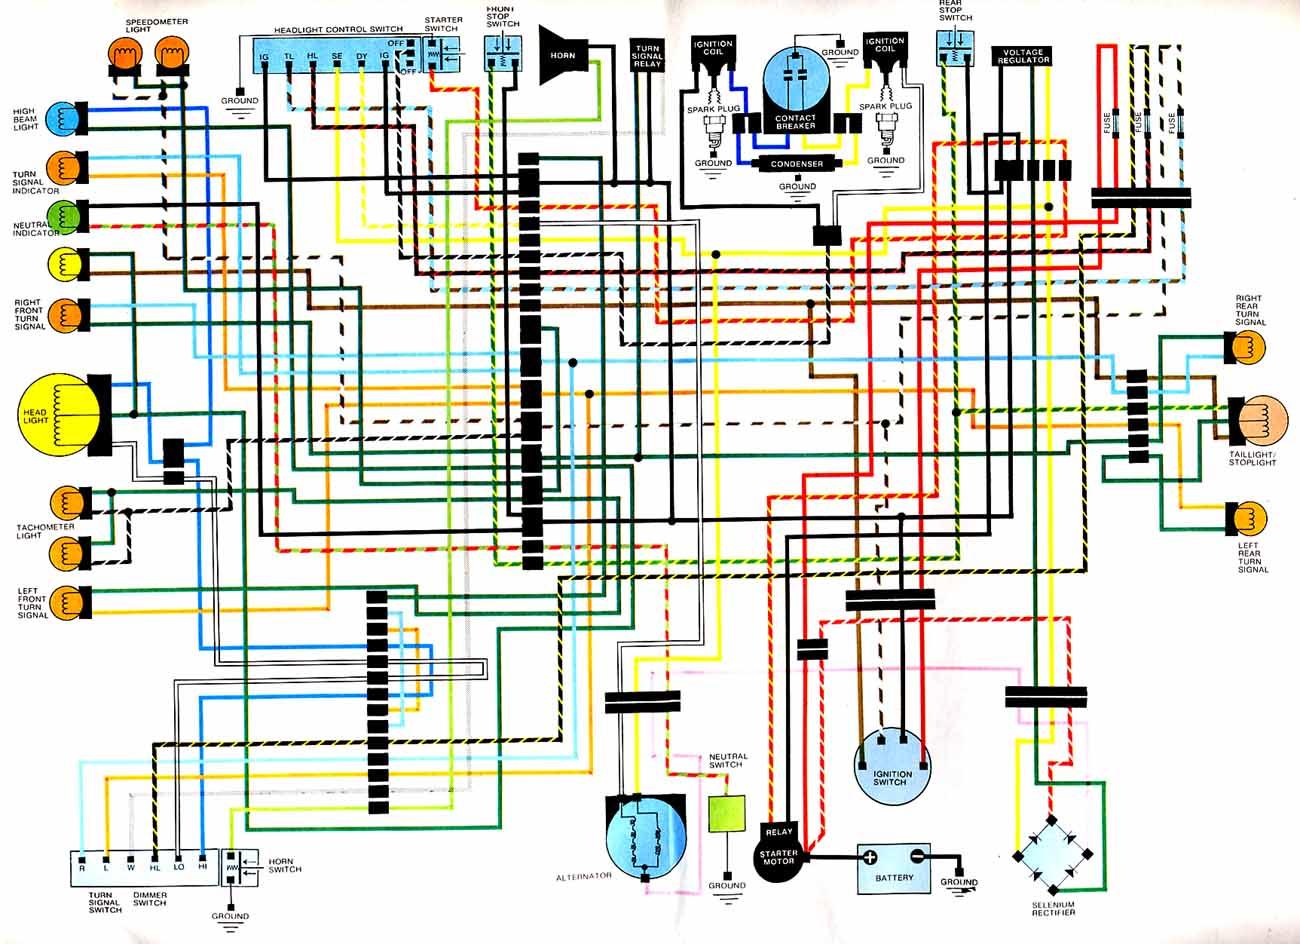 1976 honda cb750 wiring diagram tennis court with measurements cb360